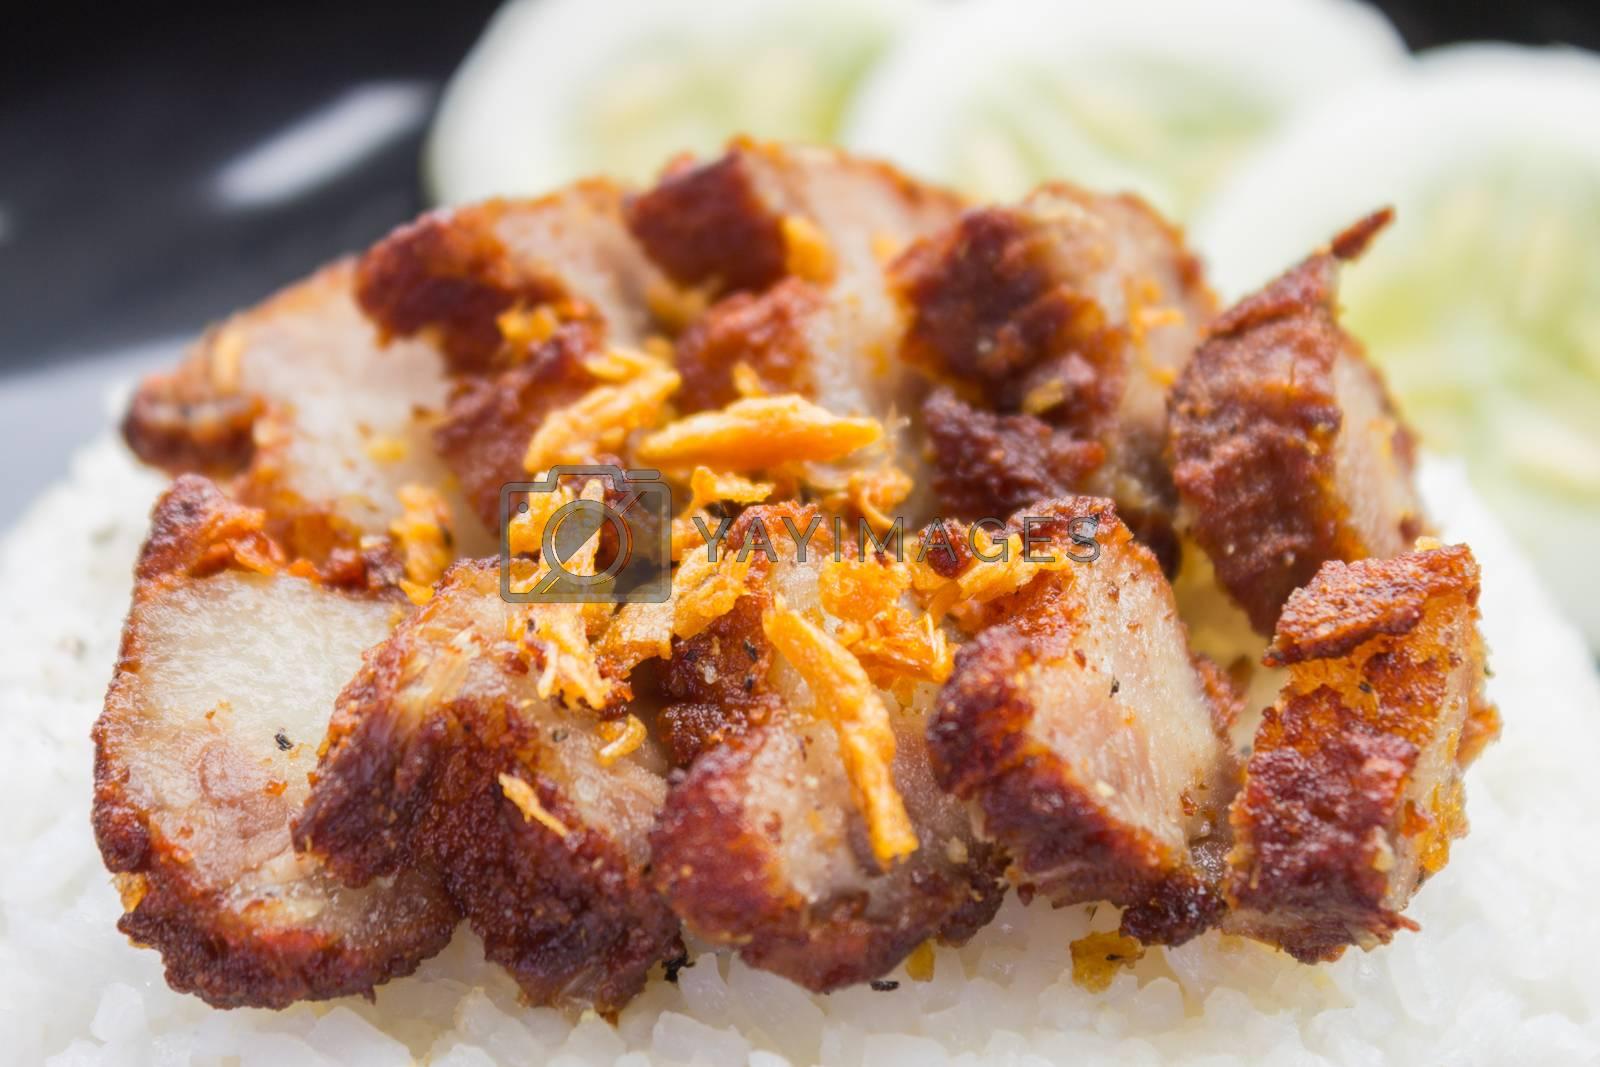 Thai Food Fried Pork with Garlic and Cucumber Zoom. Fried pork with garlic or steak on rice and cucumber zoom view in food and drink category